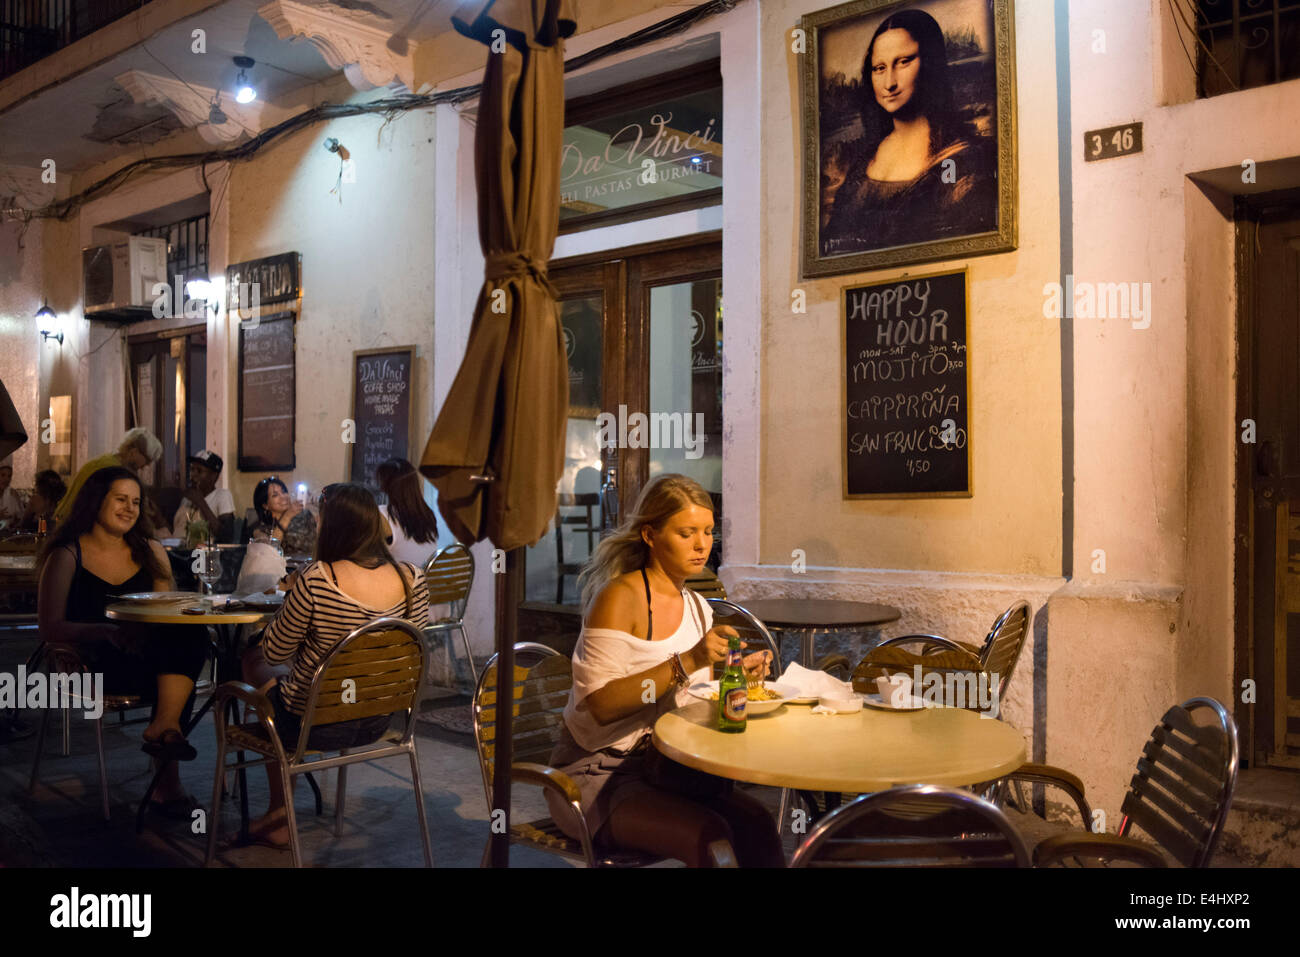 Italian Restaurant Da Vinci In Old Town Panama City San Filipe